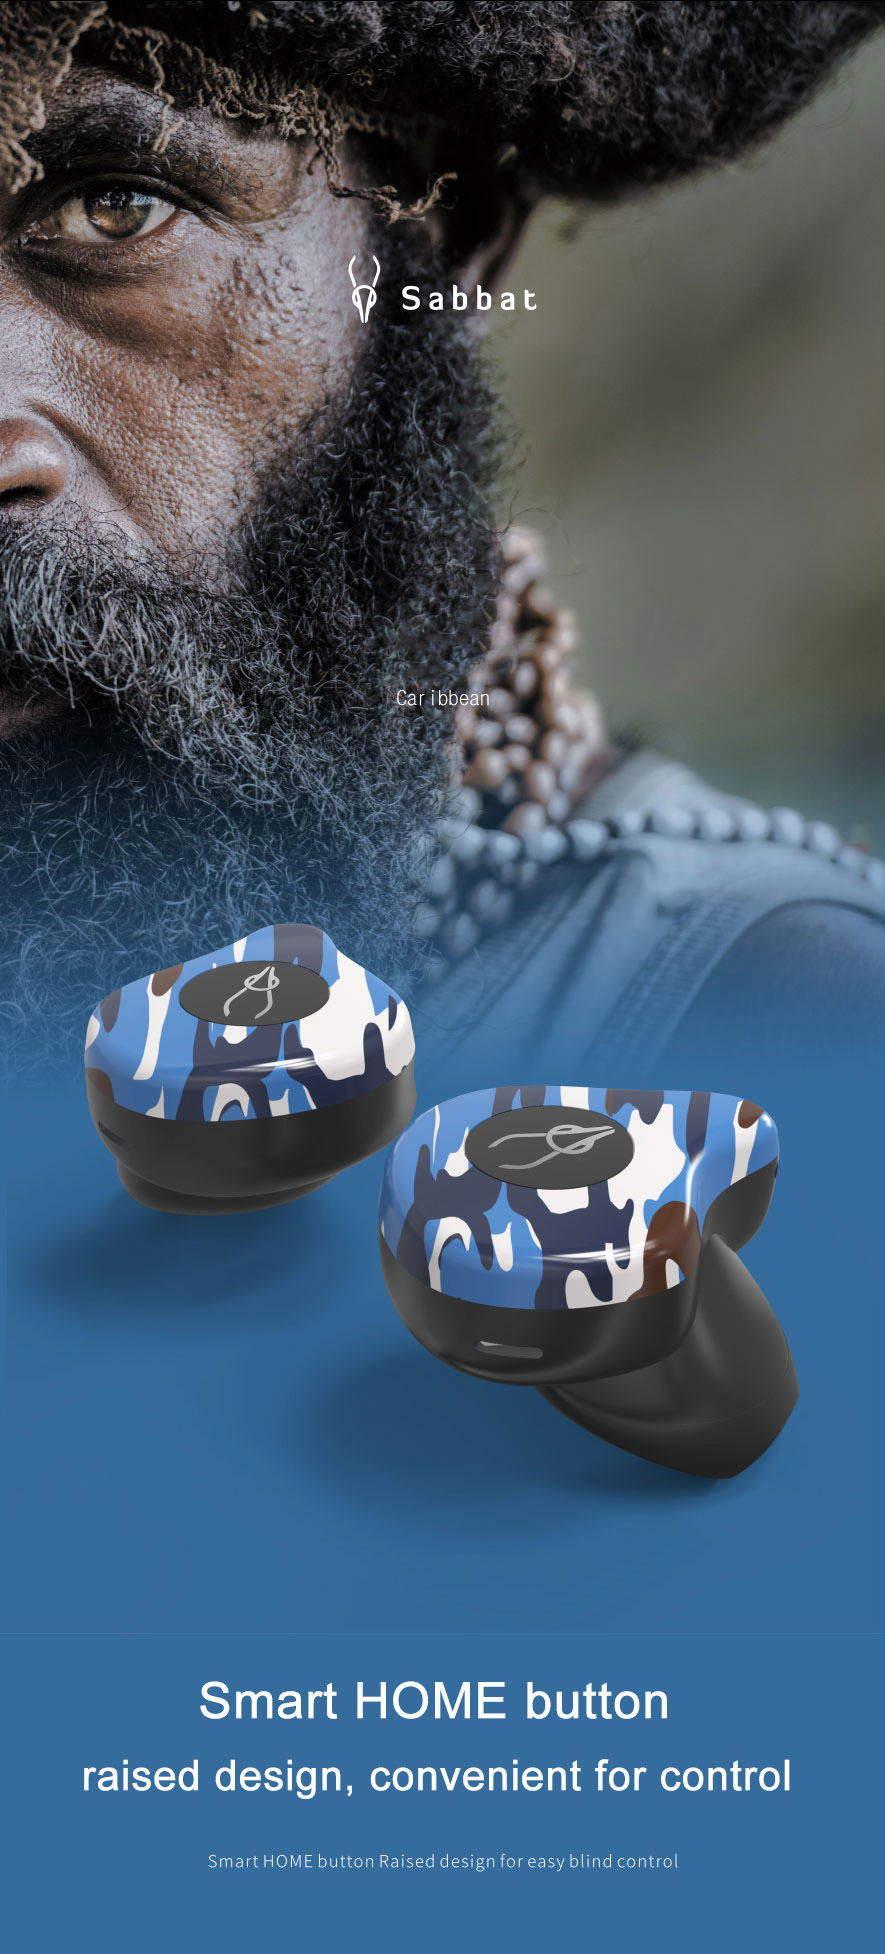 sabbat x12 ultra earbuds price